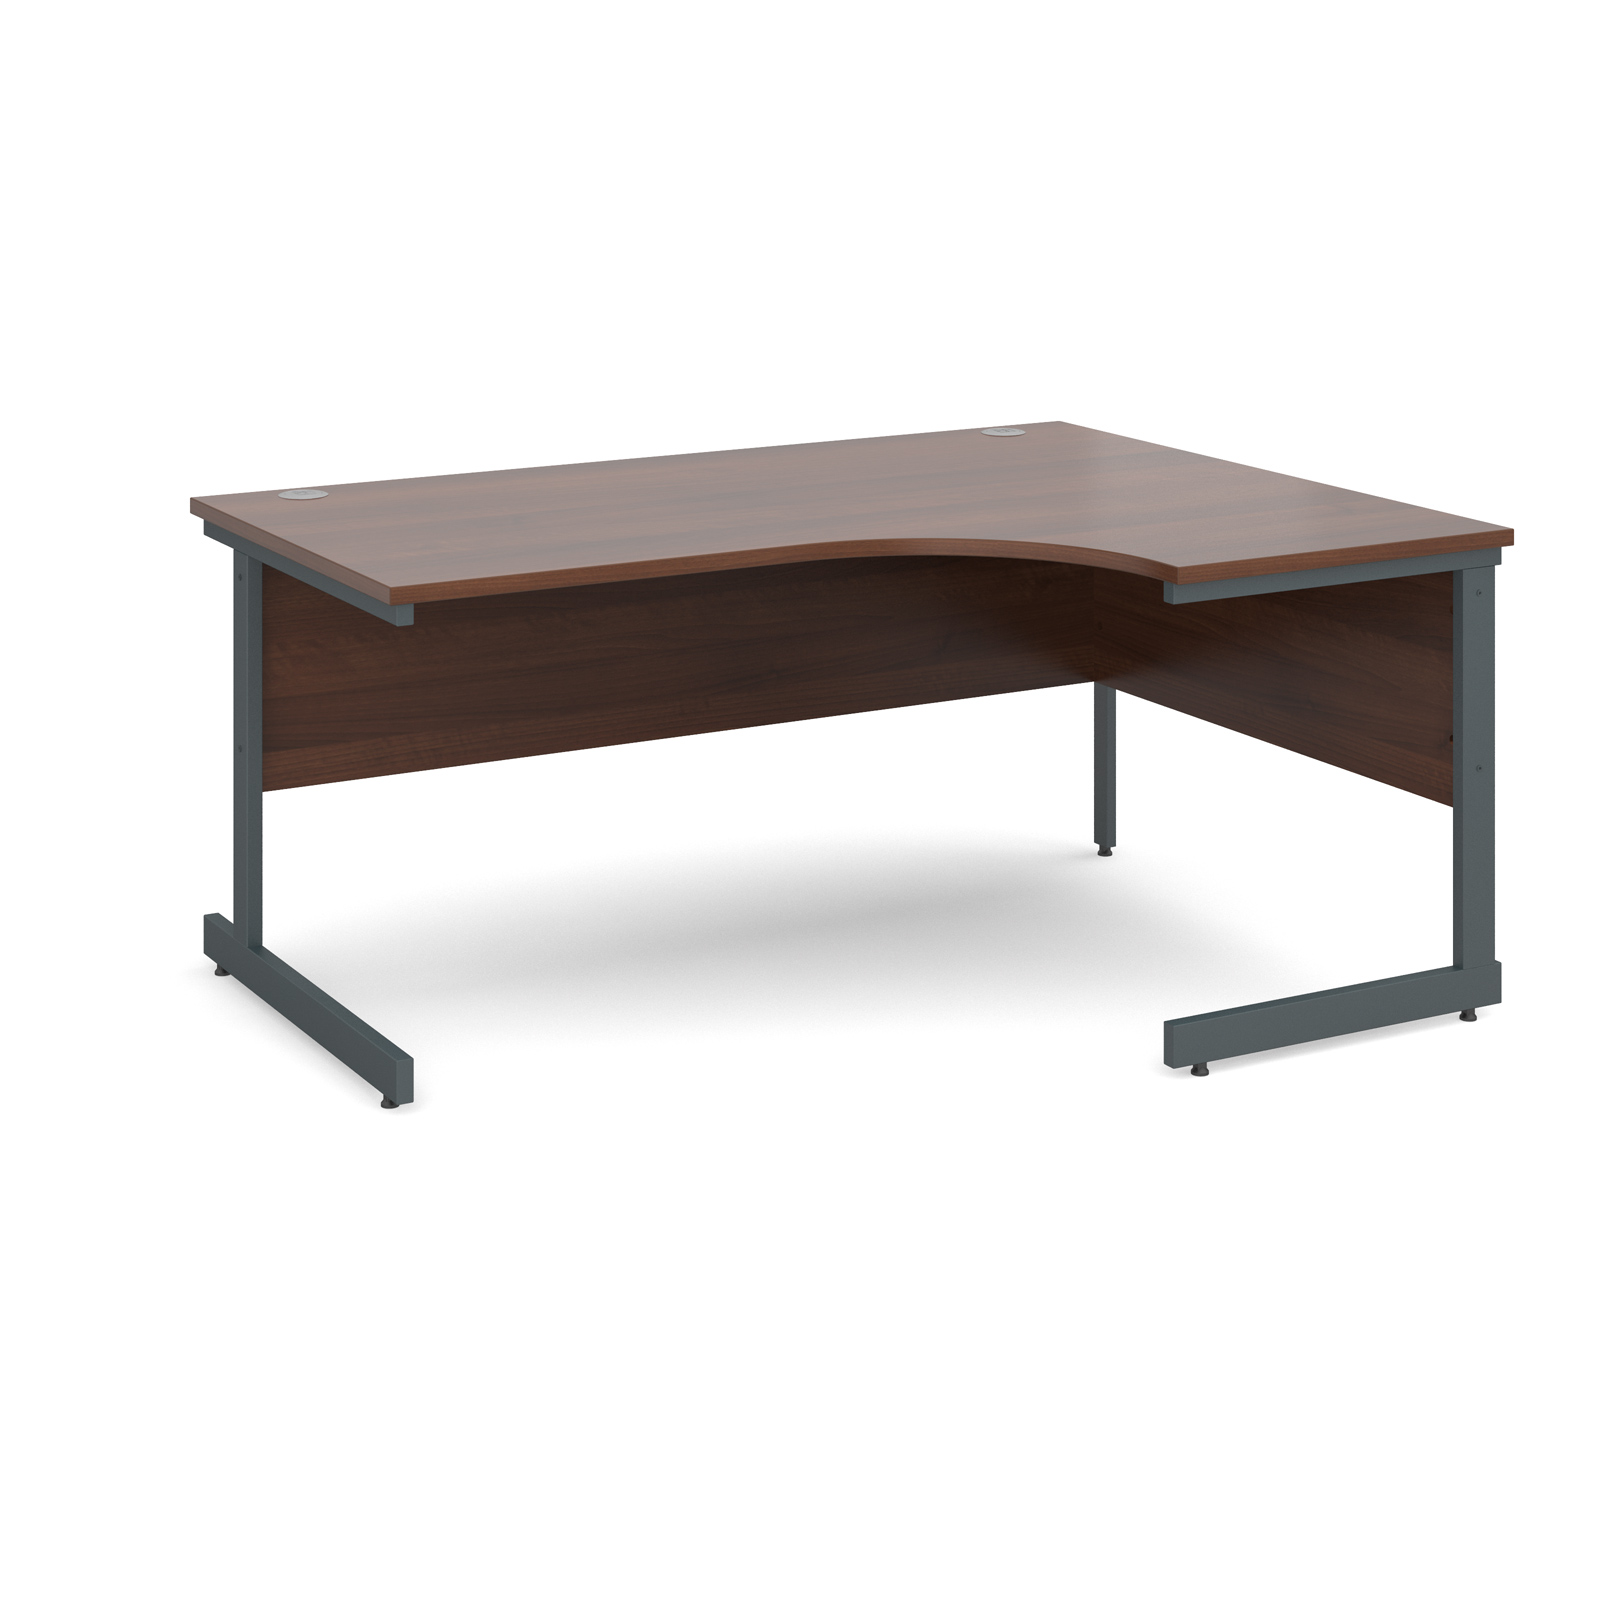 Contract 25 right hand ergonomic desk 1600mm - graphite cantilever frame, walnut top